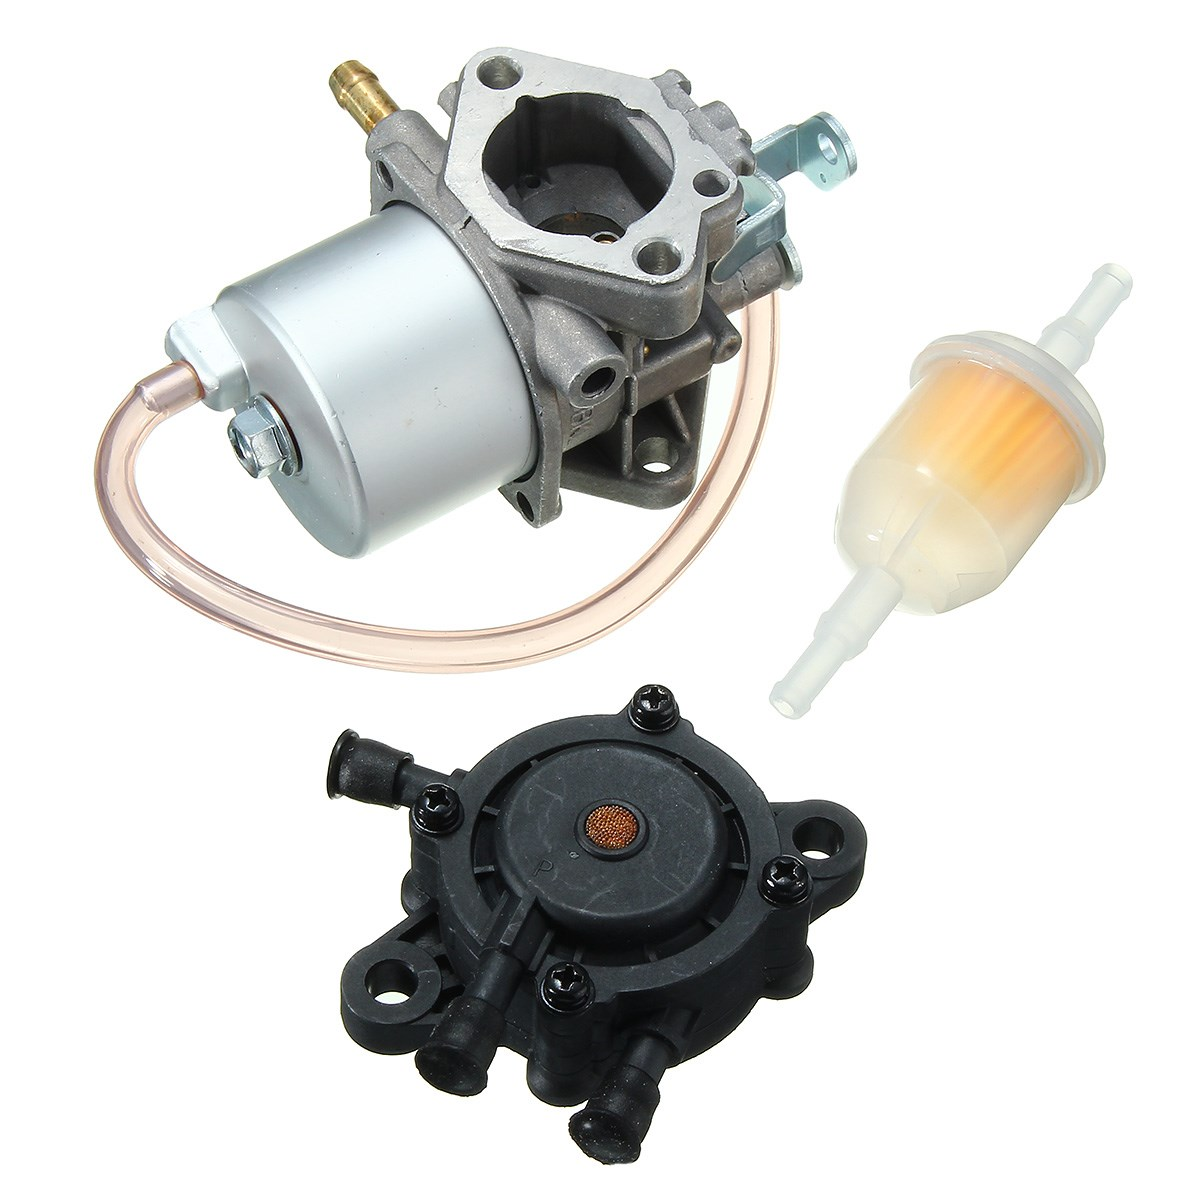 Carburetor with fuel gas pump filter for club car fe290 ds golf cart 1992